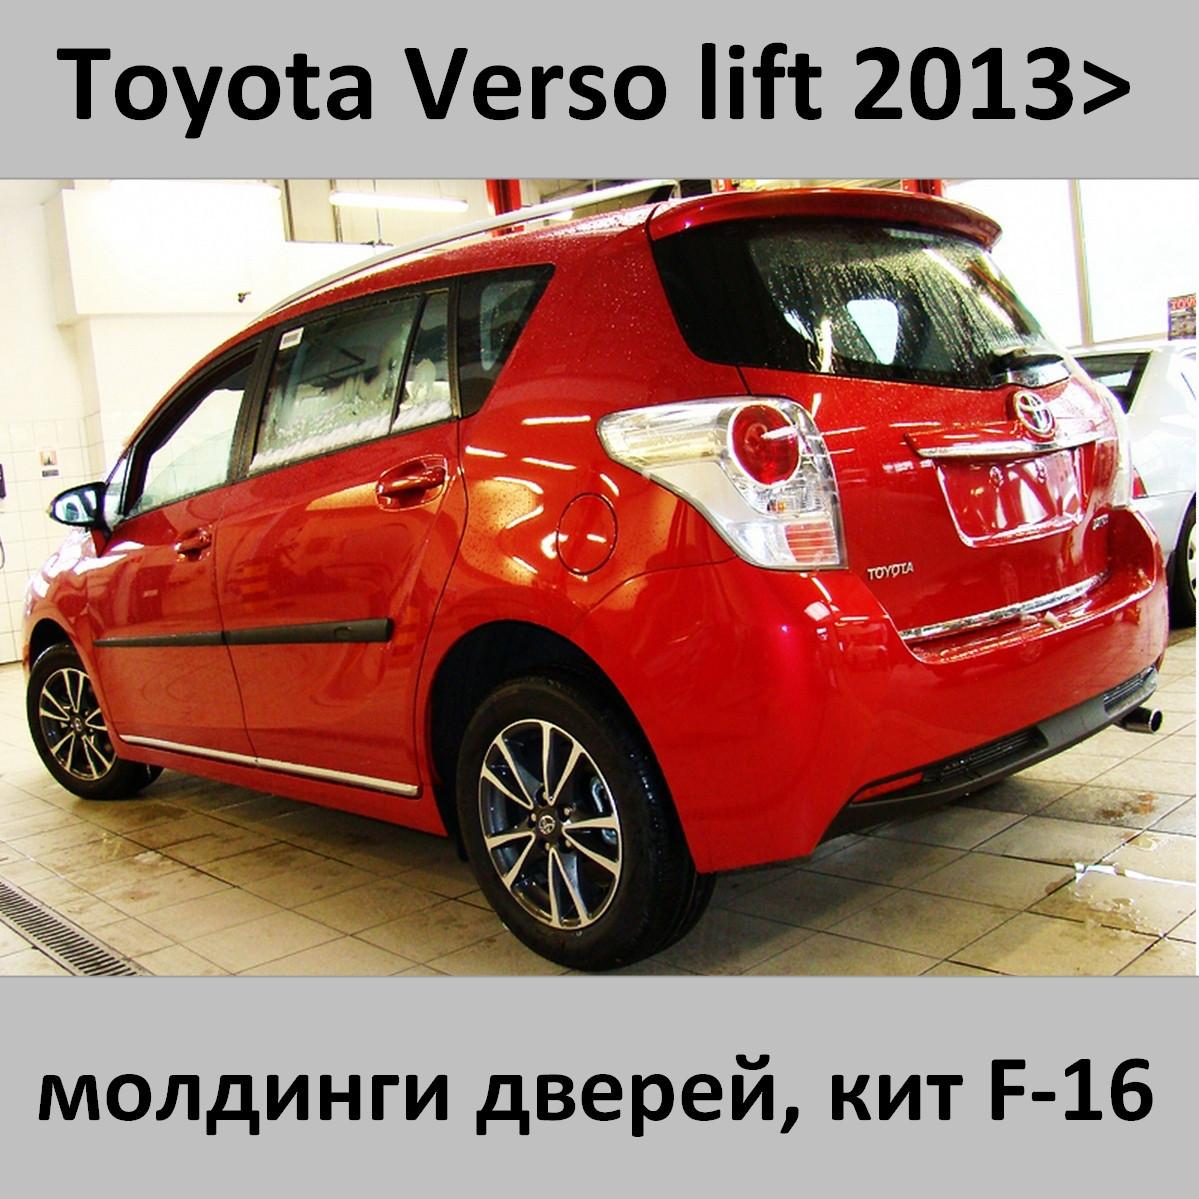 Молдинги на двери для Toyota Verso lift 2013+